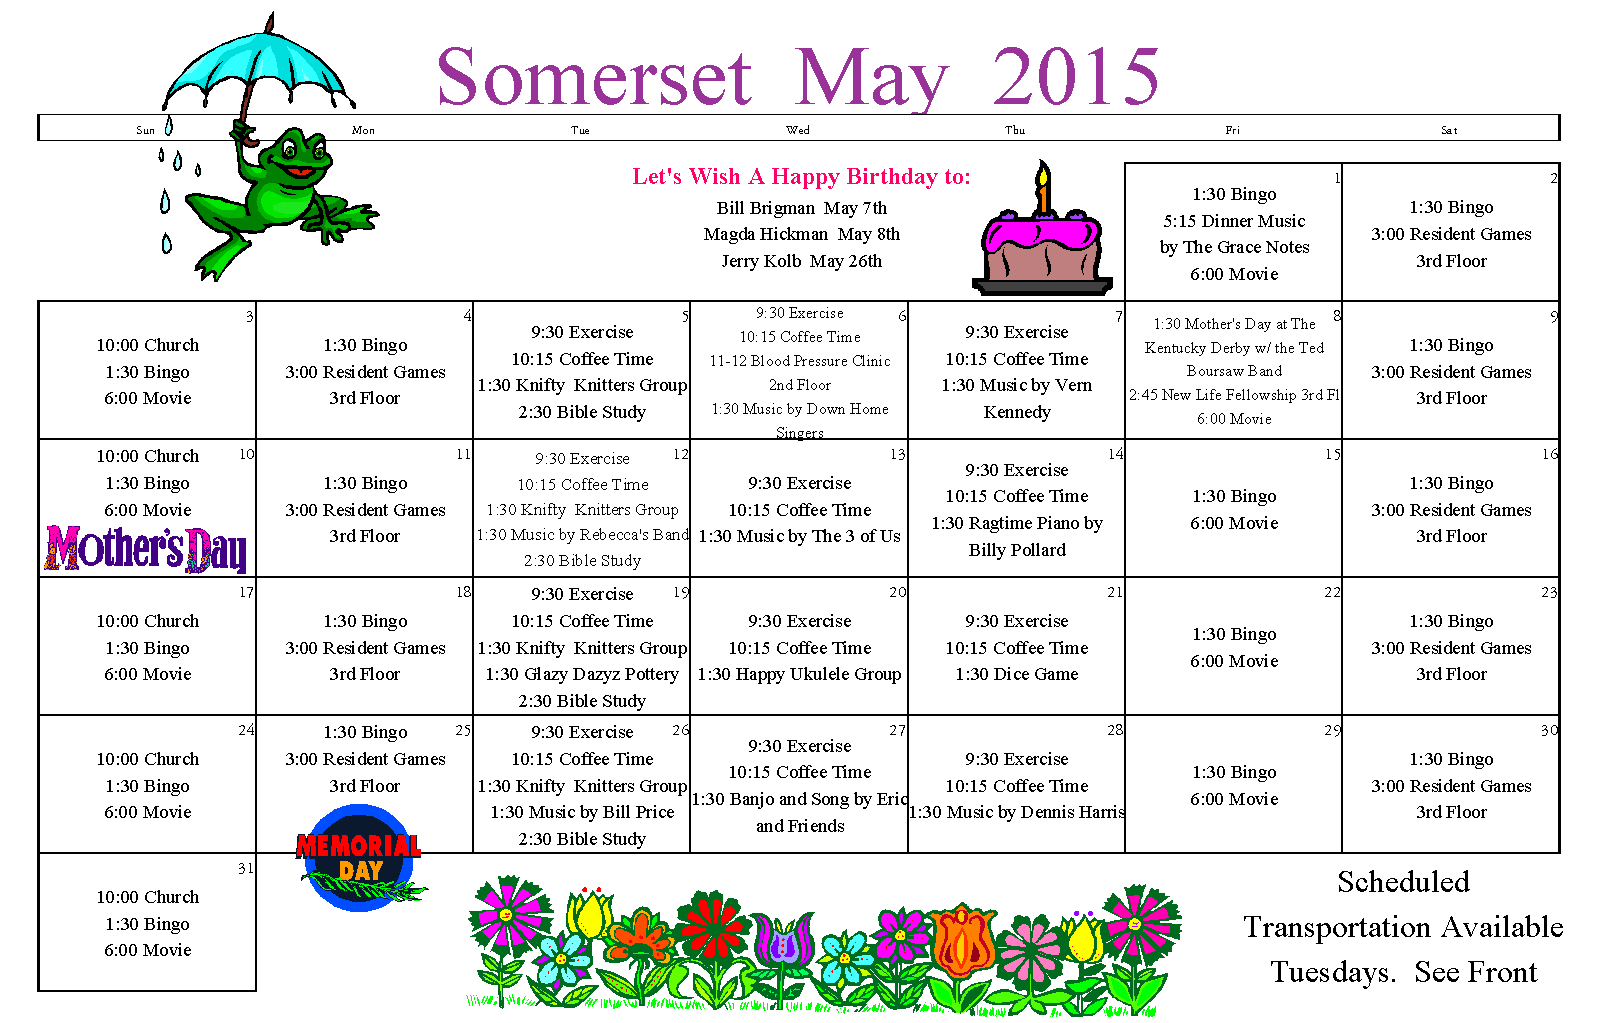 May Senior Calendar Longivew Wa | Somerset Senior Living with Sample Caendar For Assisted Living Facilities